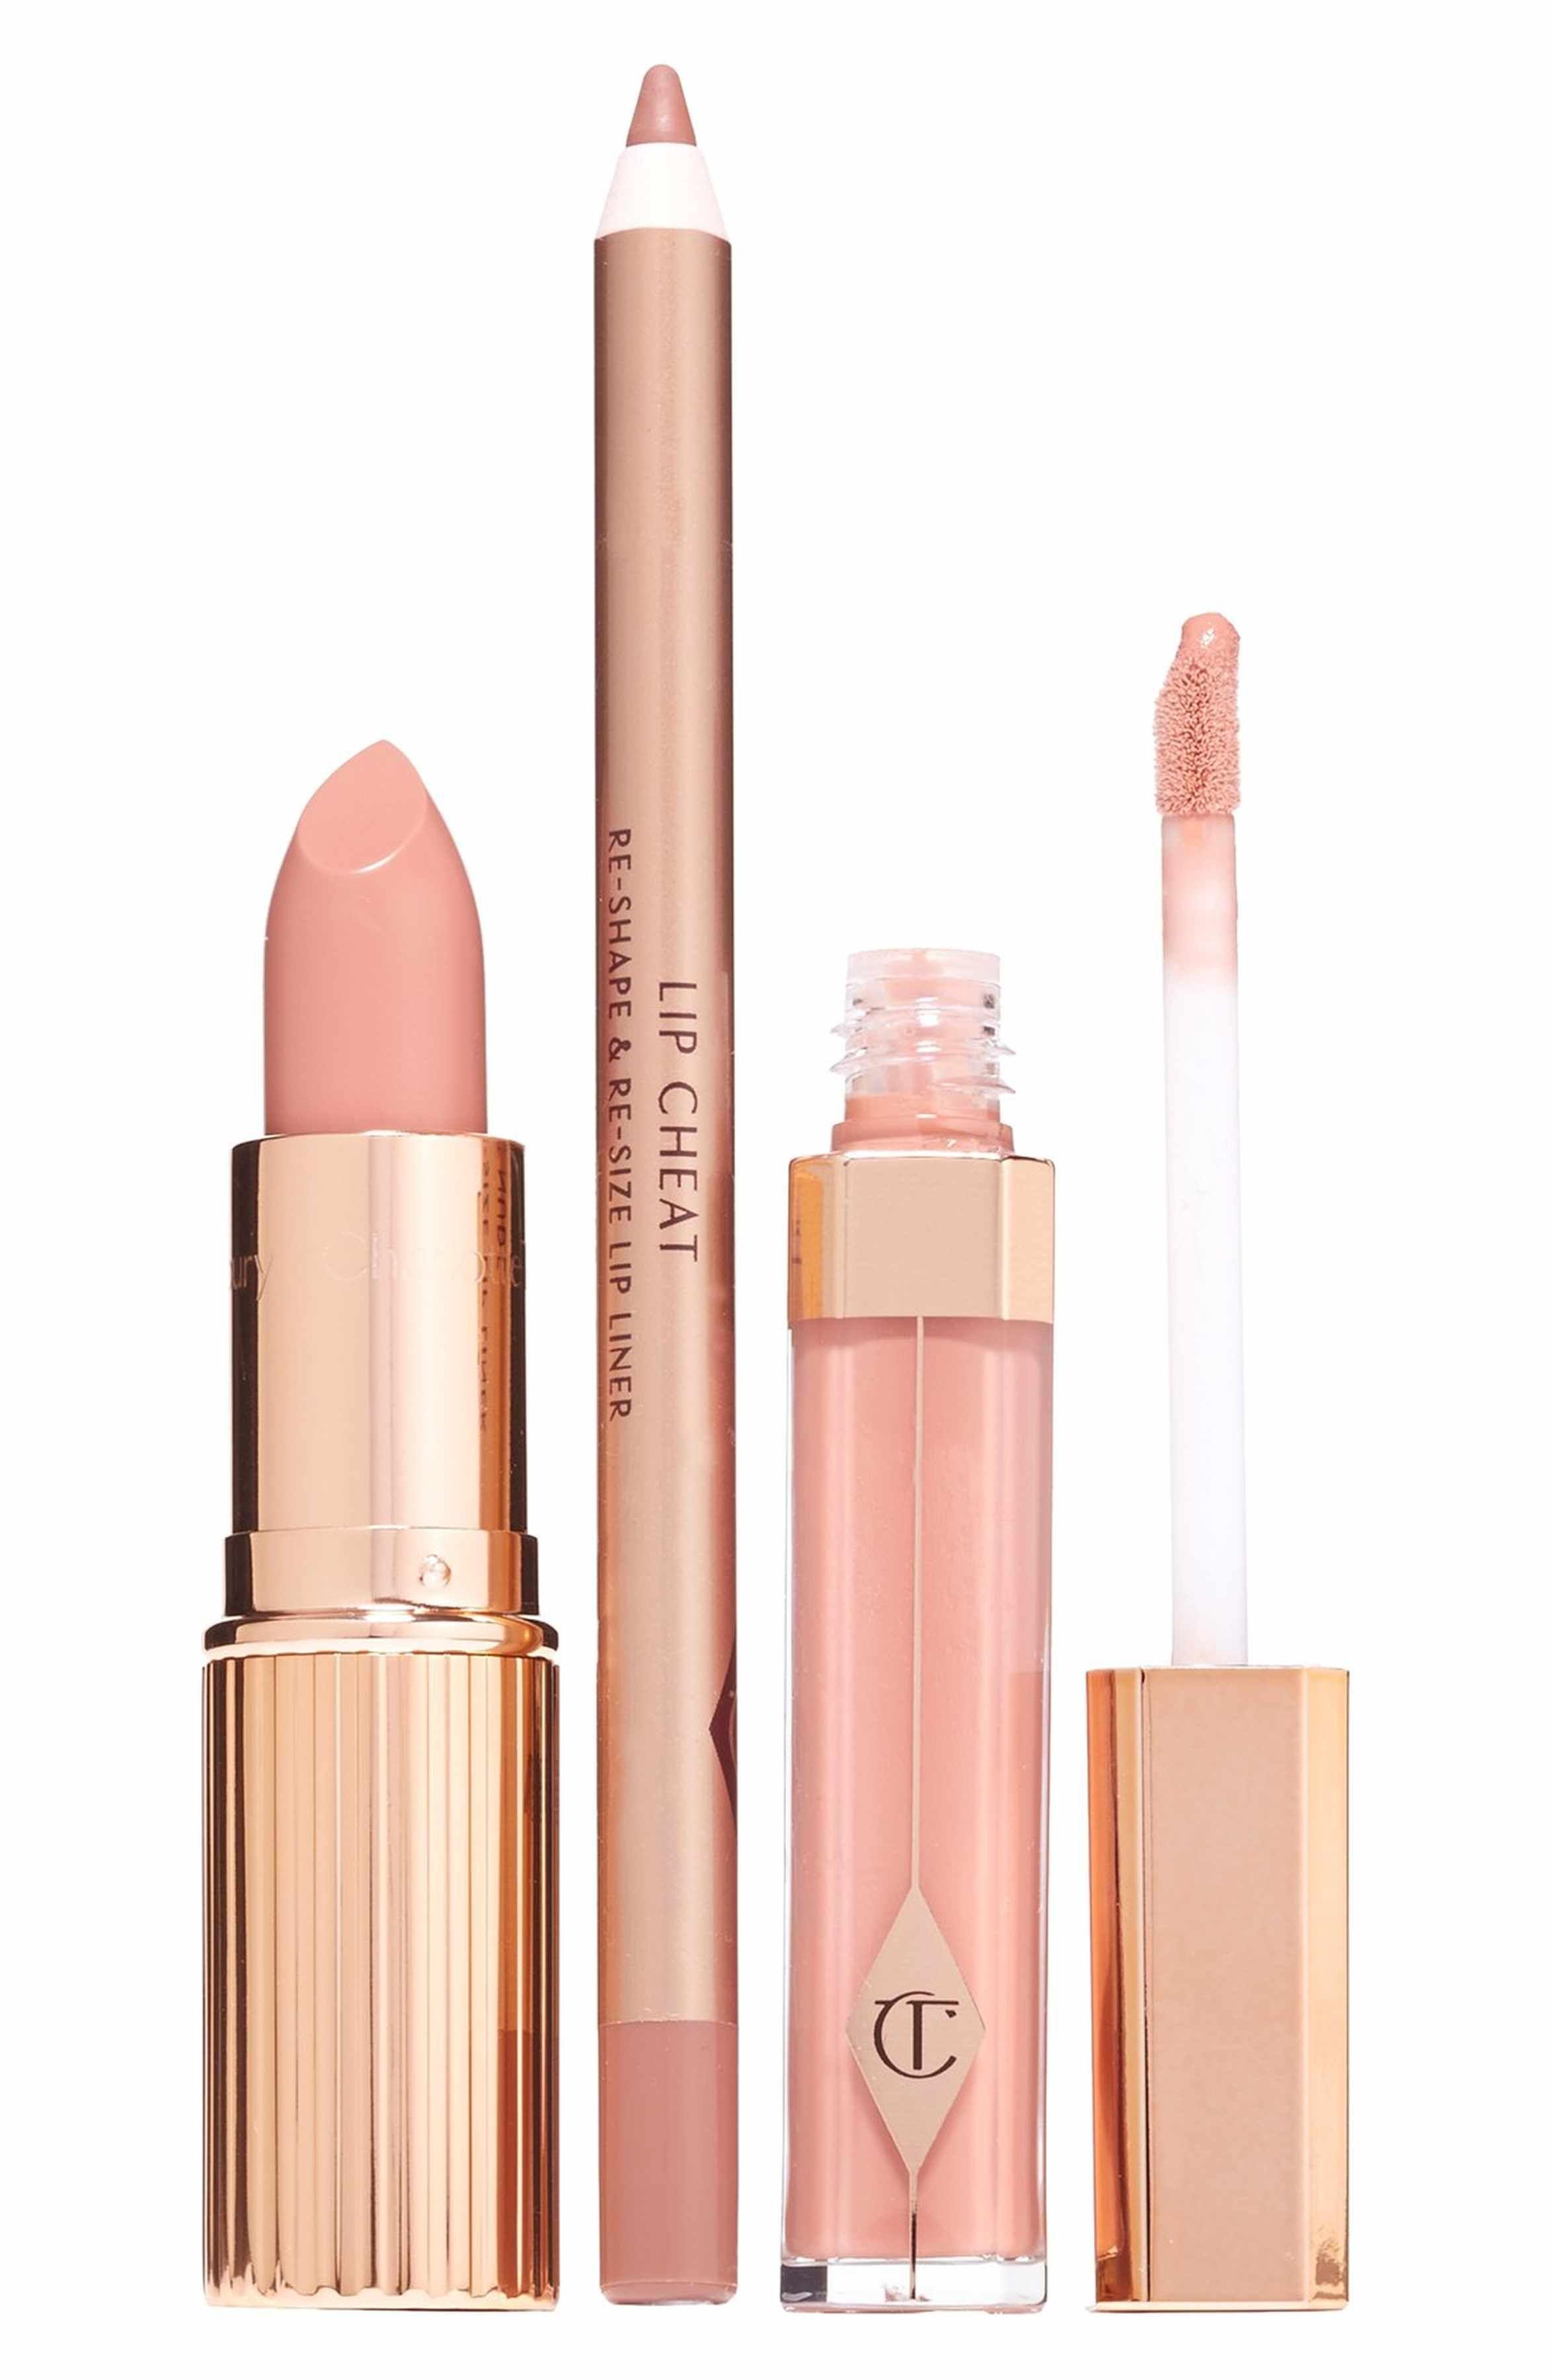 KI.S.S.I.N.G. Lipstick | Nordstrom | Charlotte tilbury hot